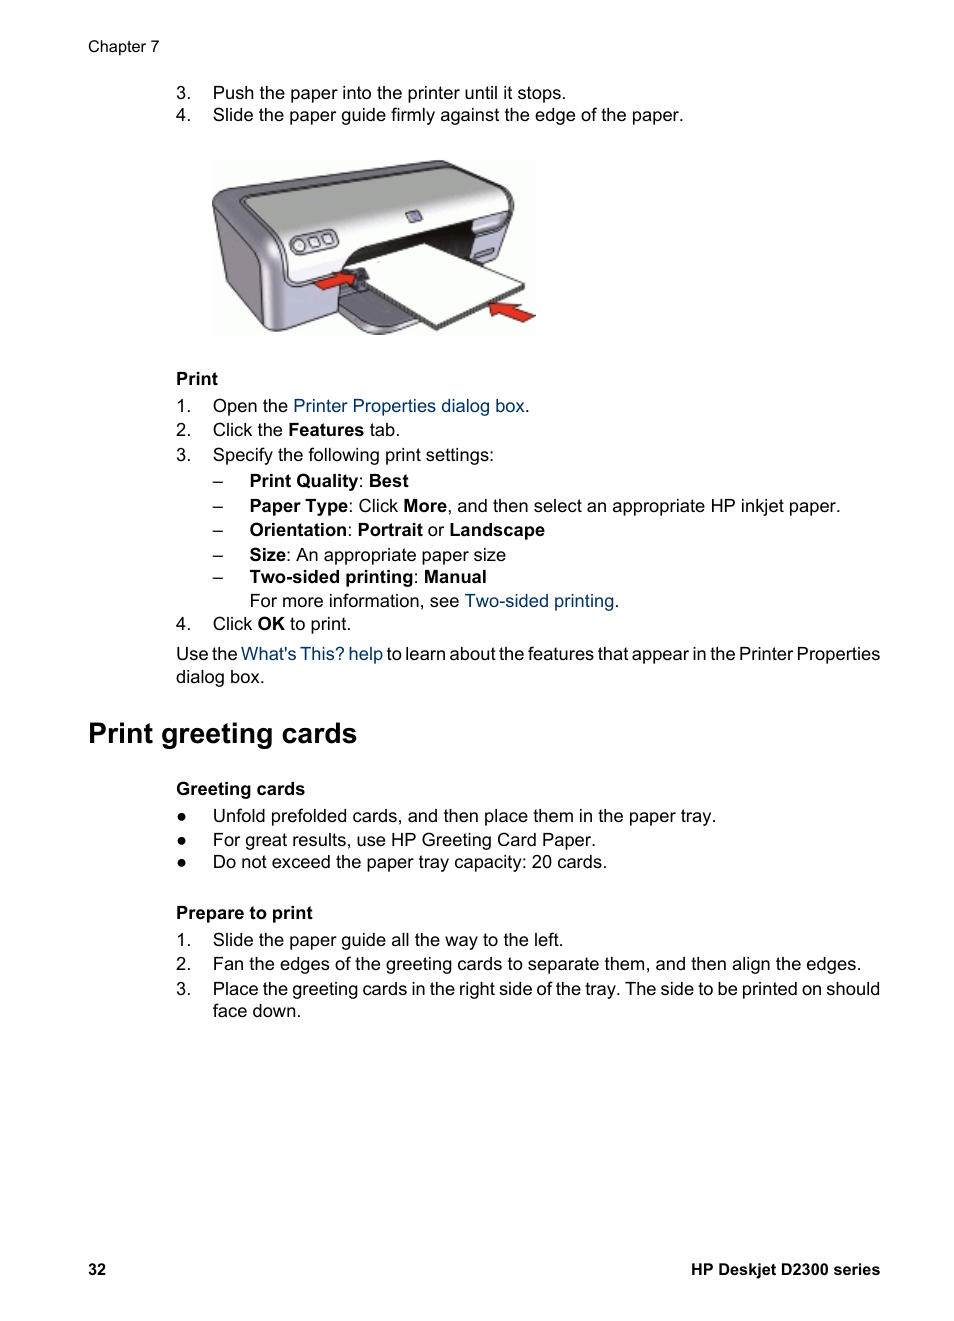 Print greeting cards greeting cards hp deskjet d2345 printer user print greeting cards greeting cards hp deskjet d2345 printer user manual page 34 88 m4hsunfo